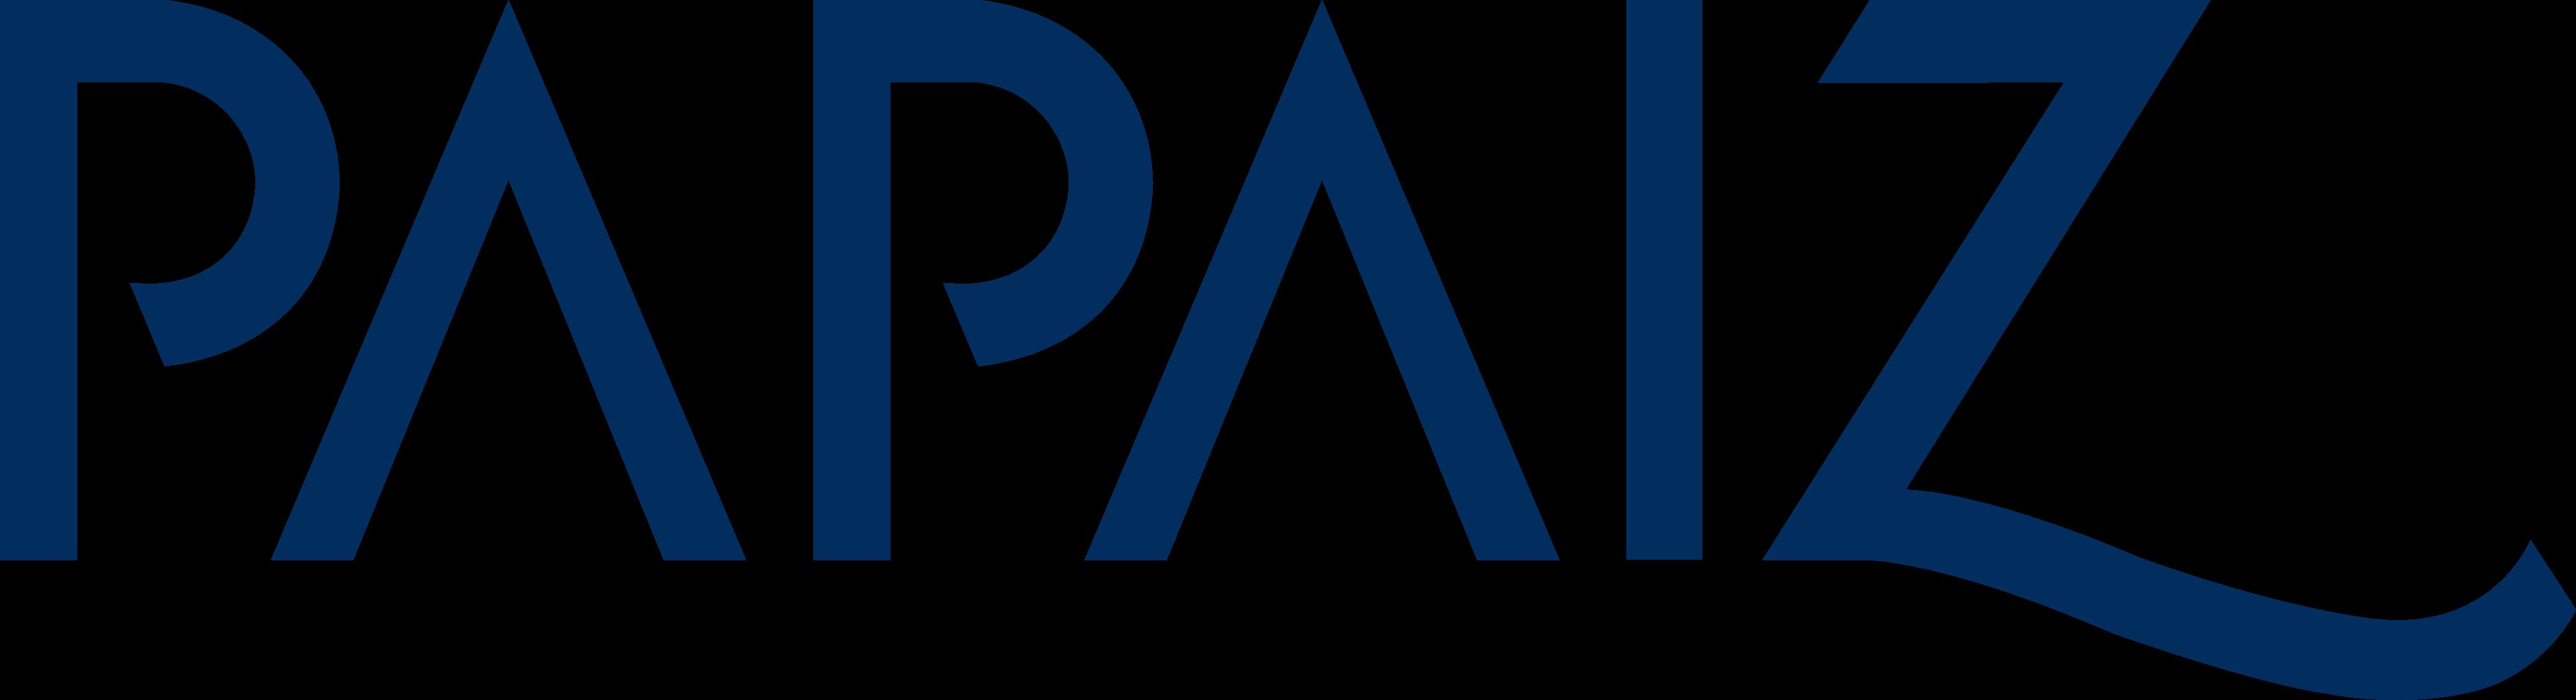 Papaiz Logo.